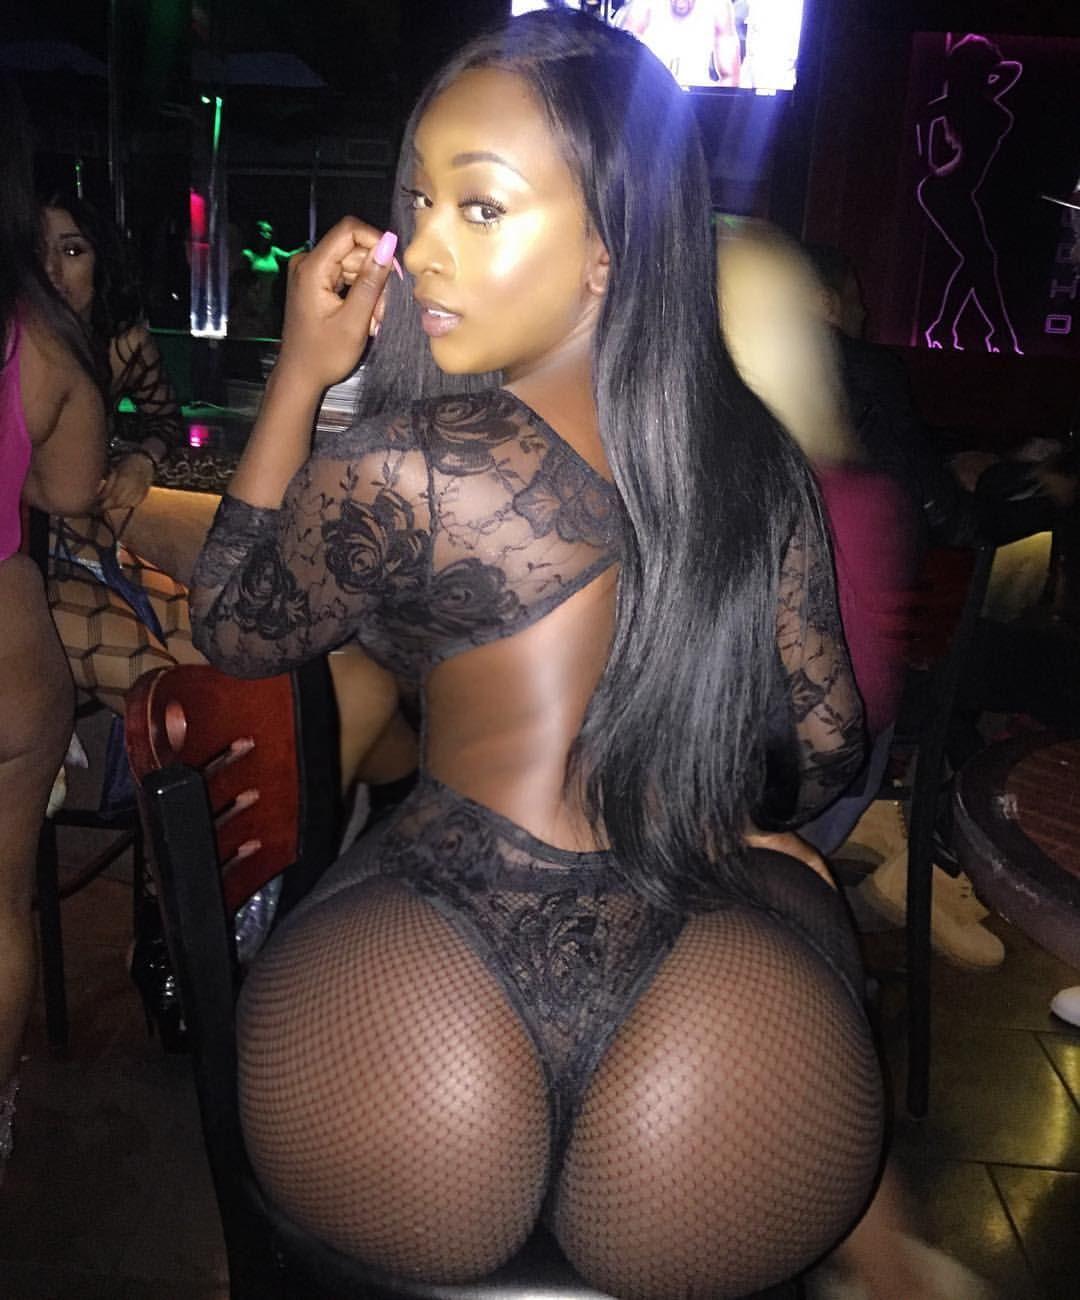 Ebony juicy booty hoochie